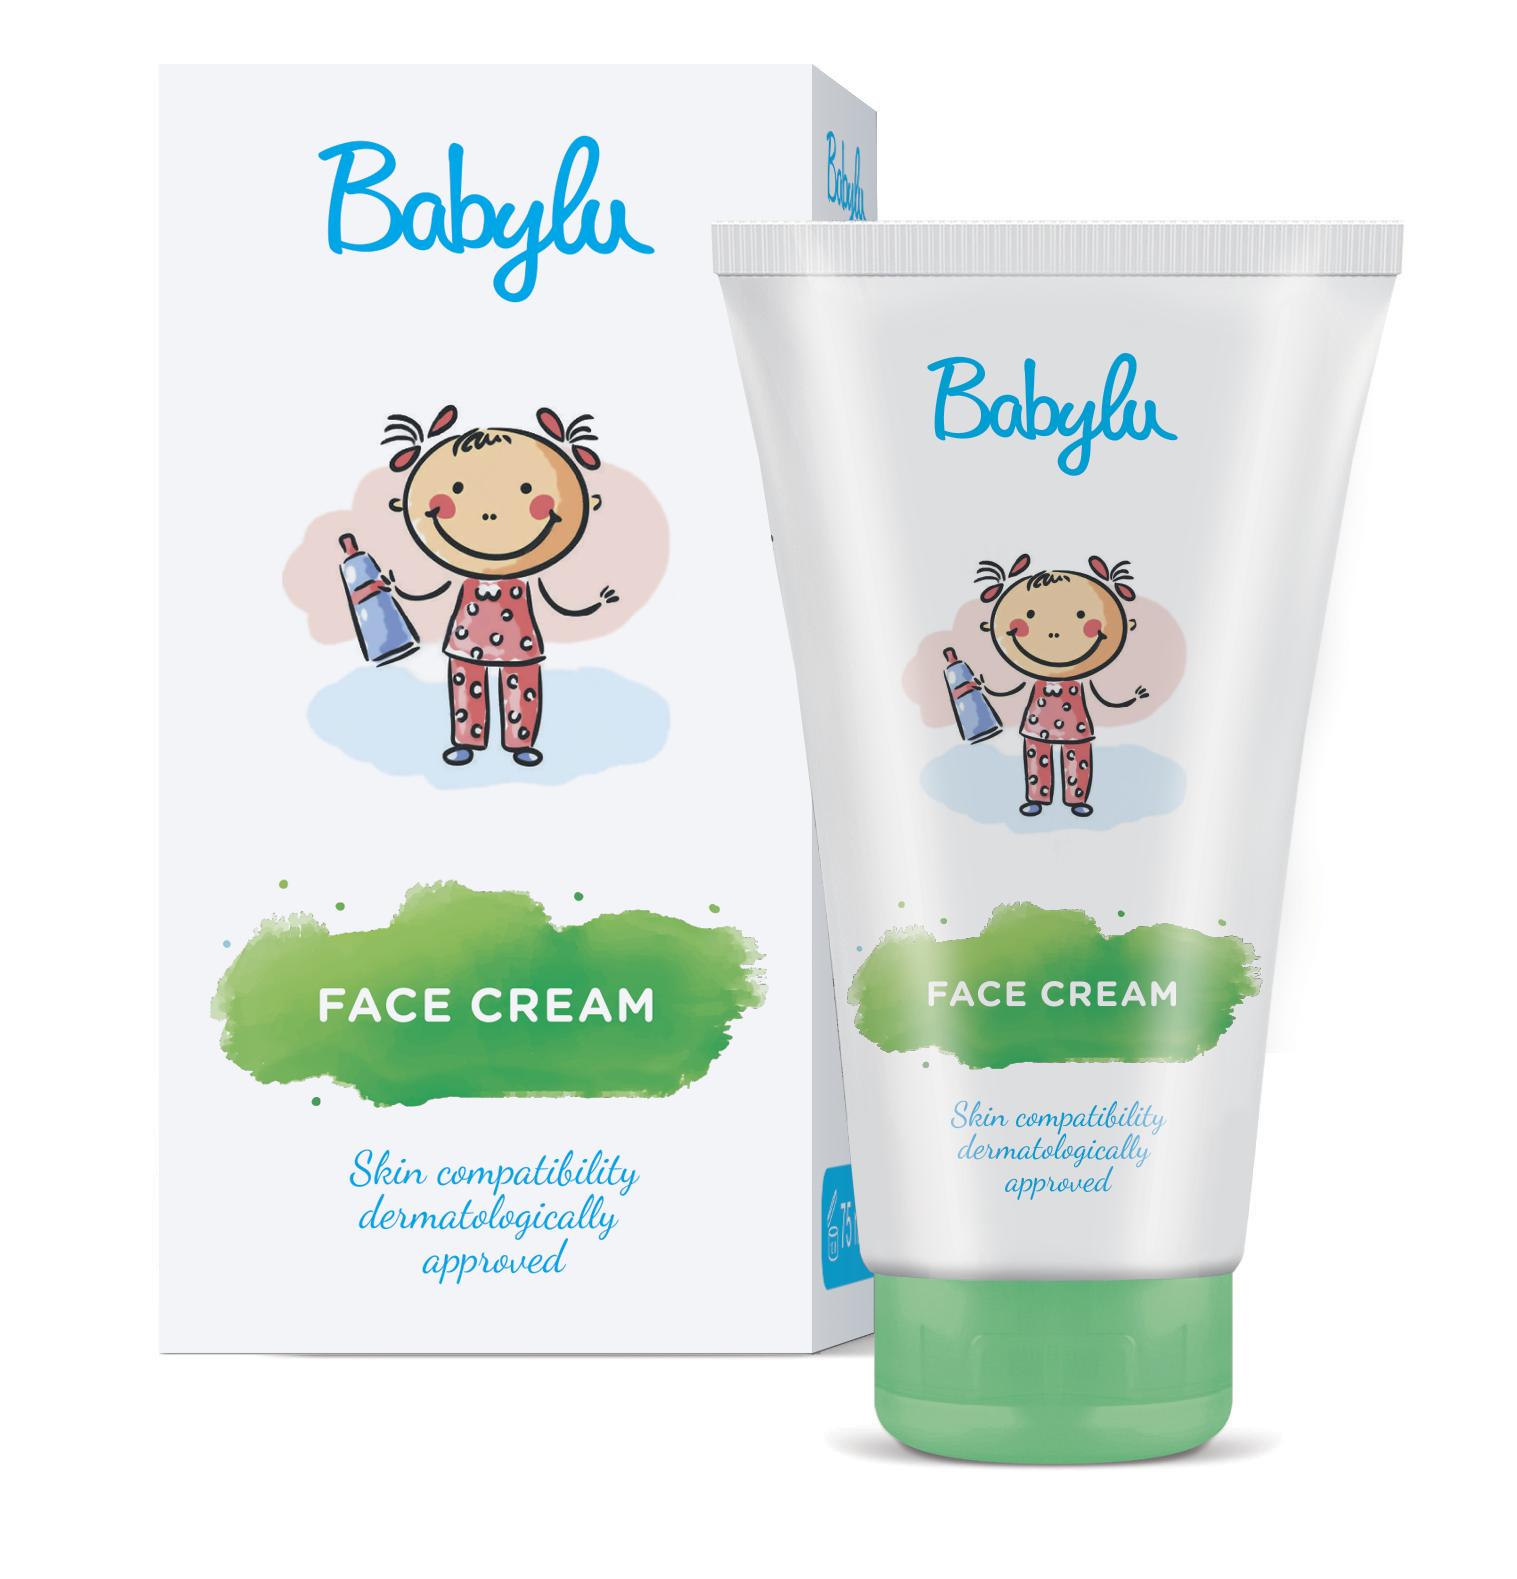 baby face cream containing aloe vera